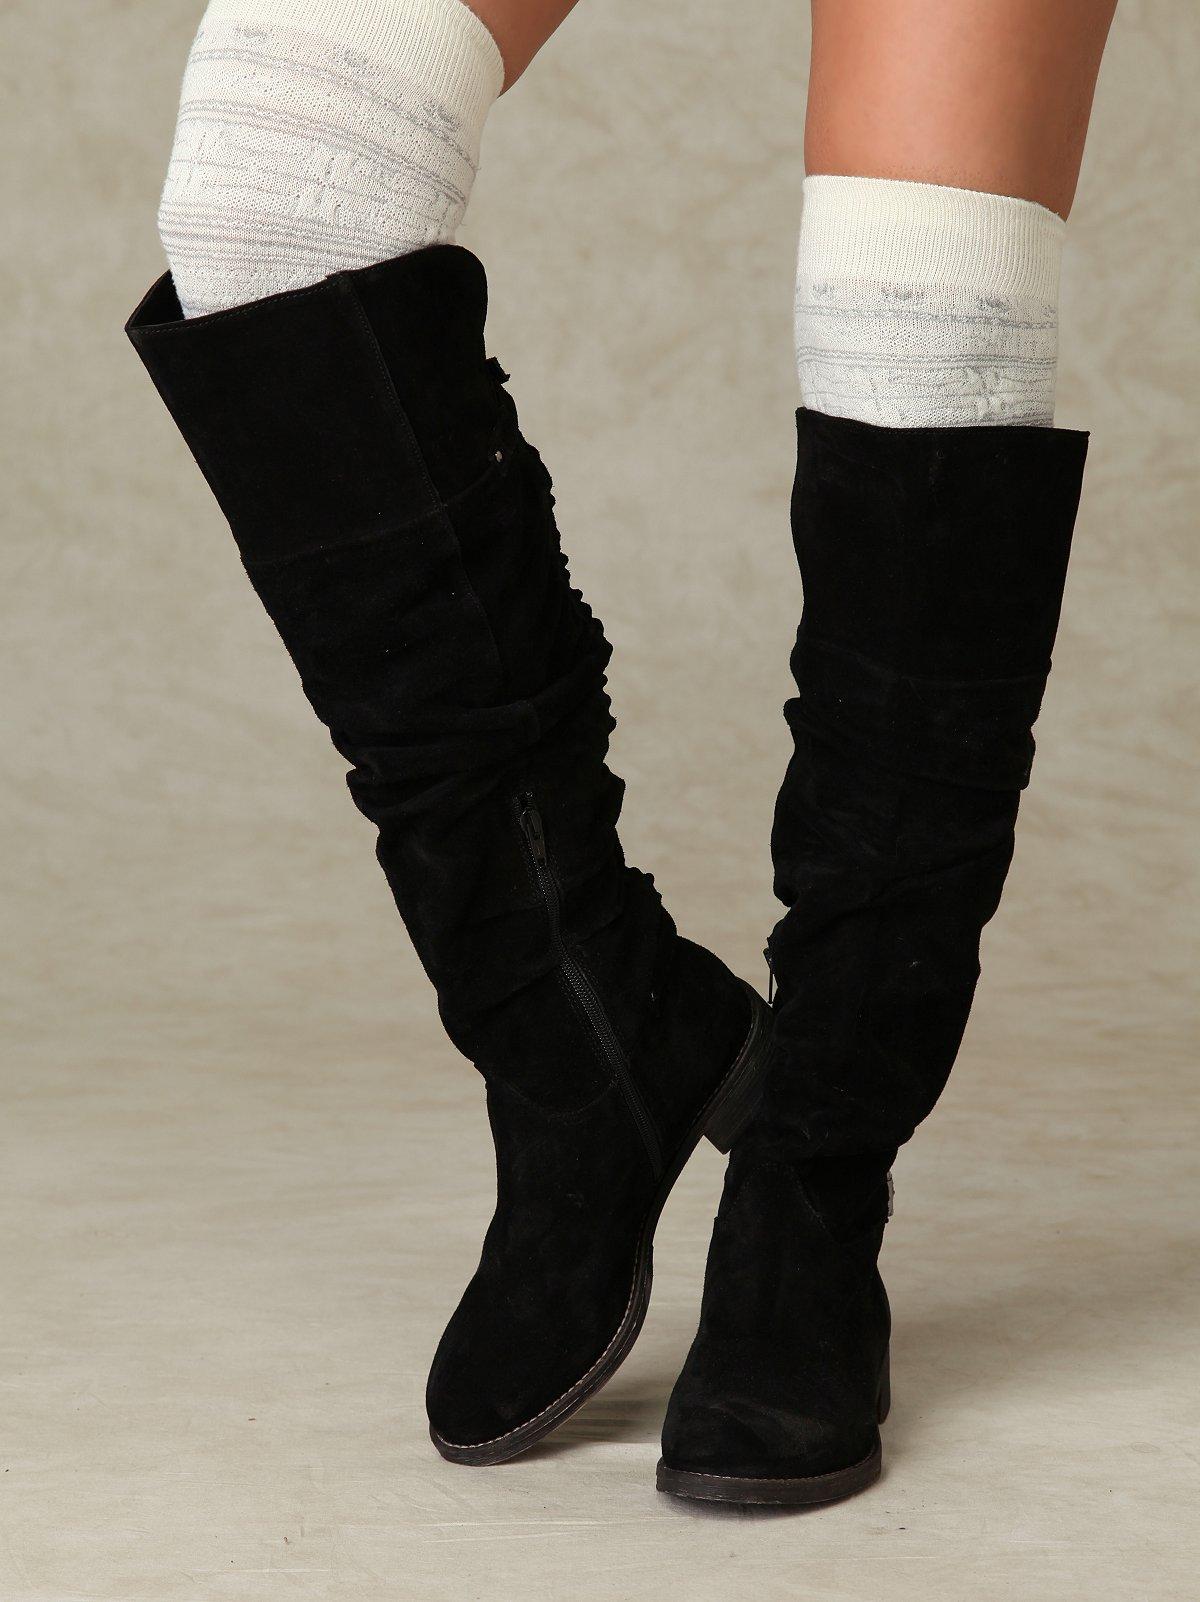 Nixxa Ruffle Boot